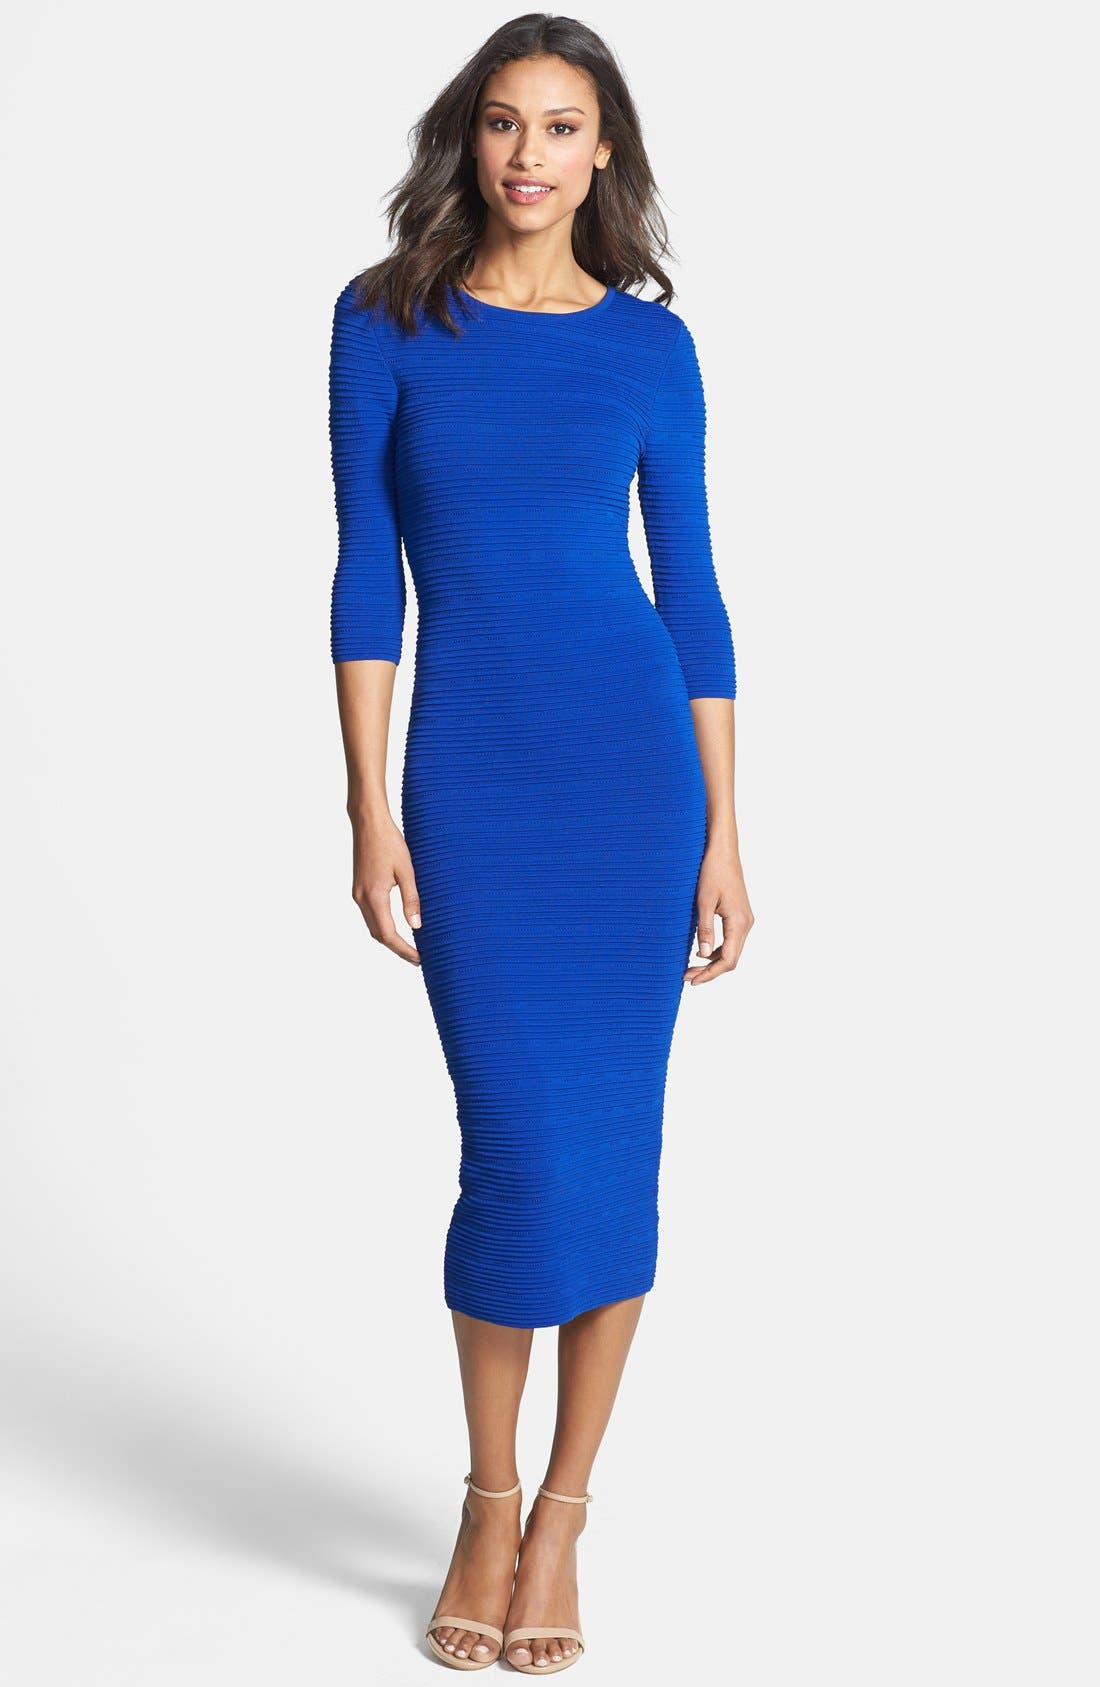 Alternate Image 1 Selected - Felicity & Coco Knit Body-Con Midi Dress (Petite) (Nordstrom Exclusive)